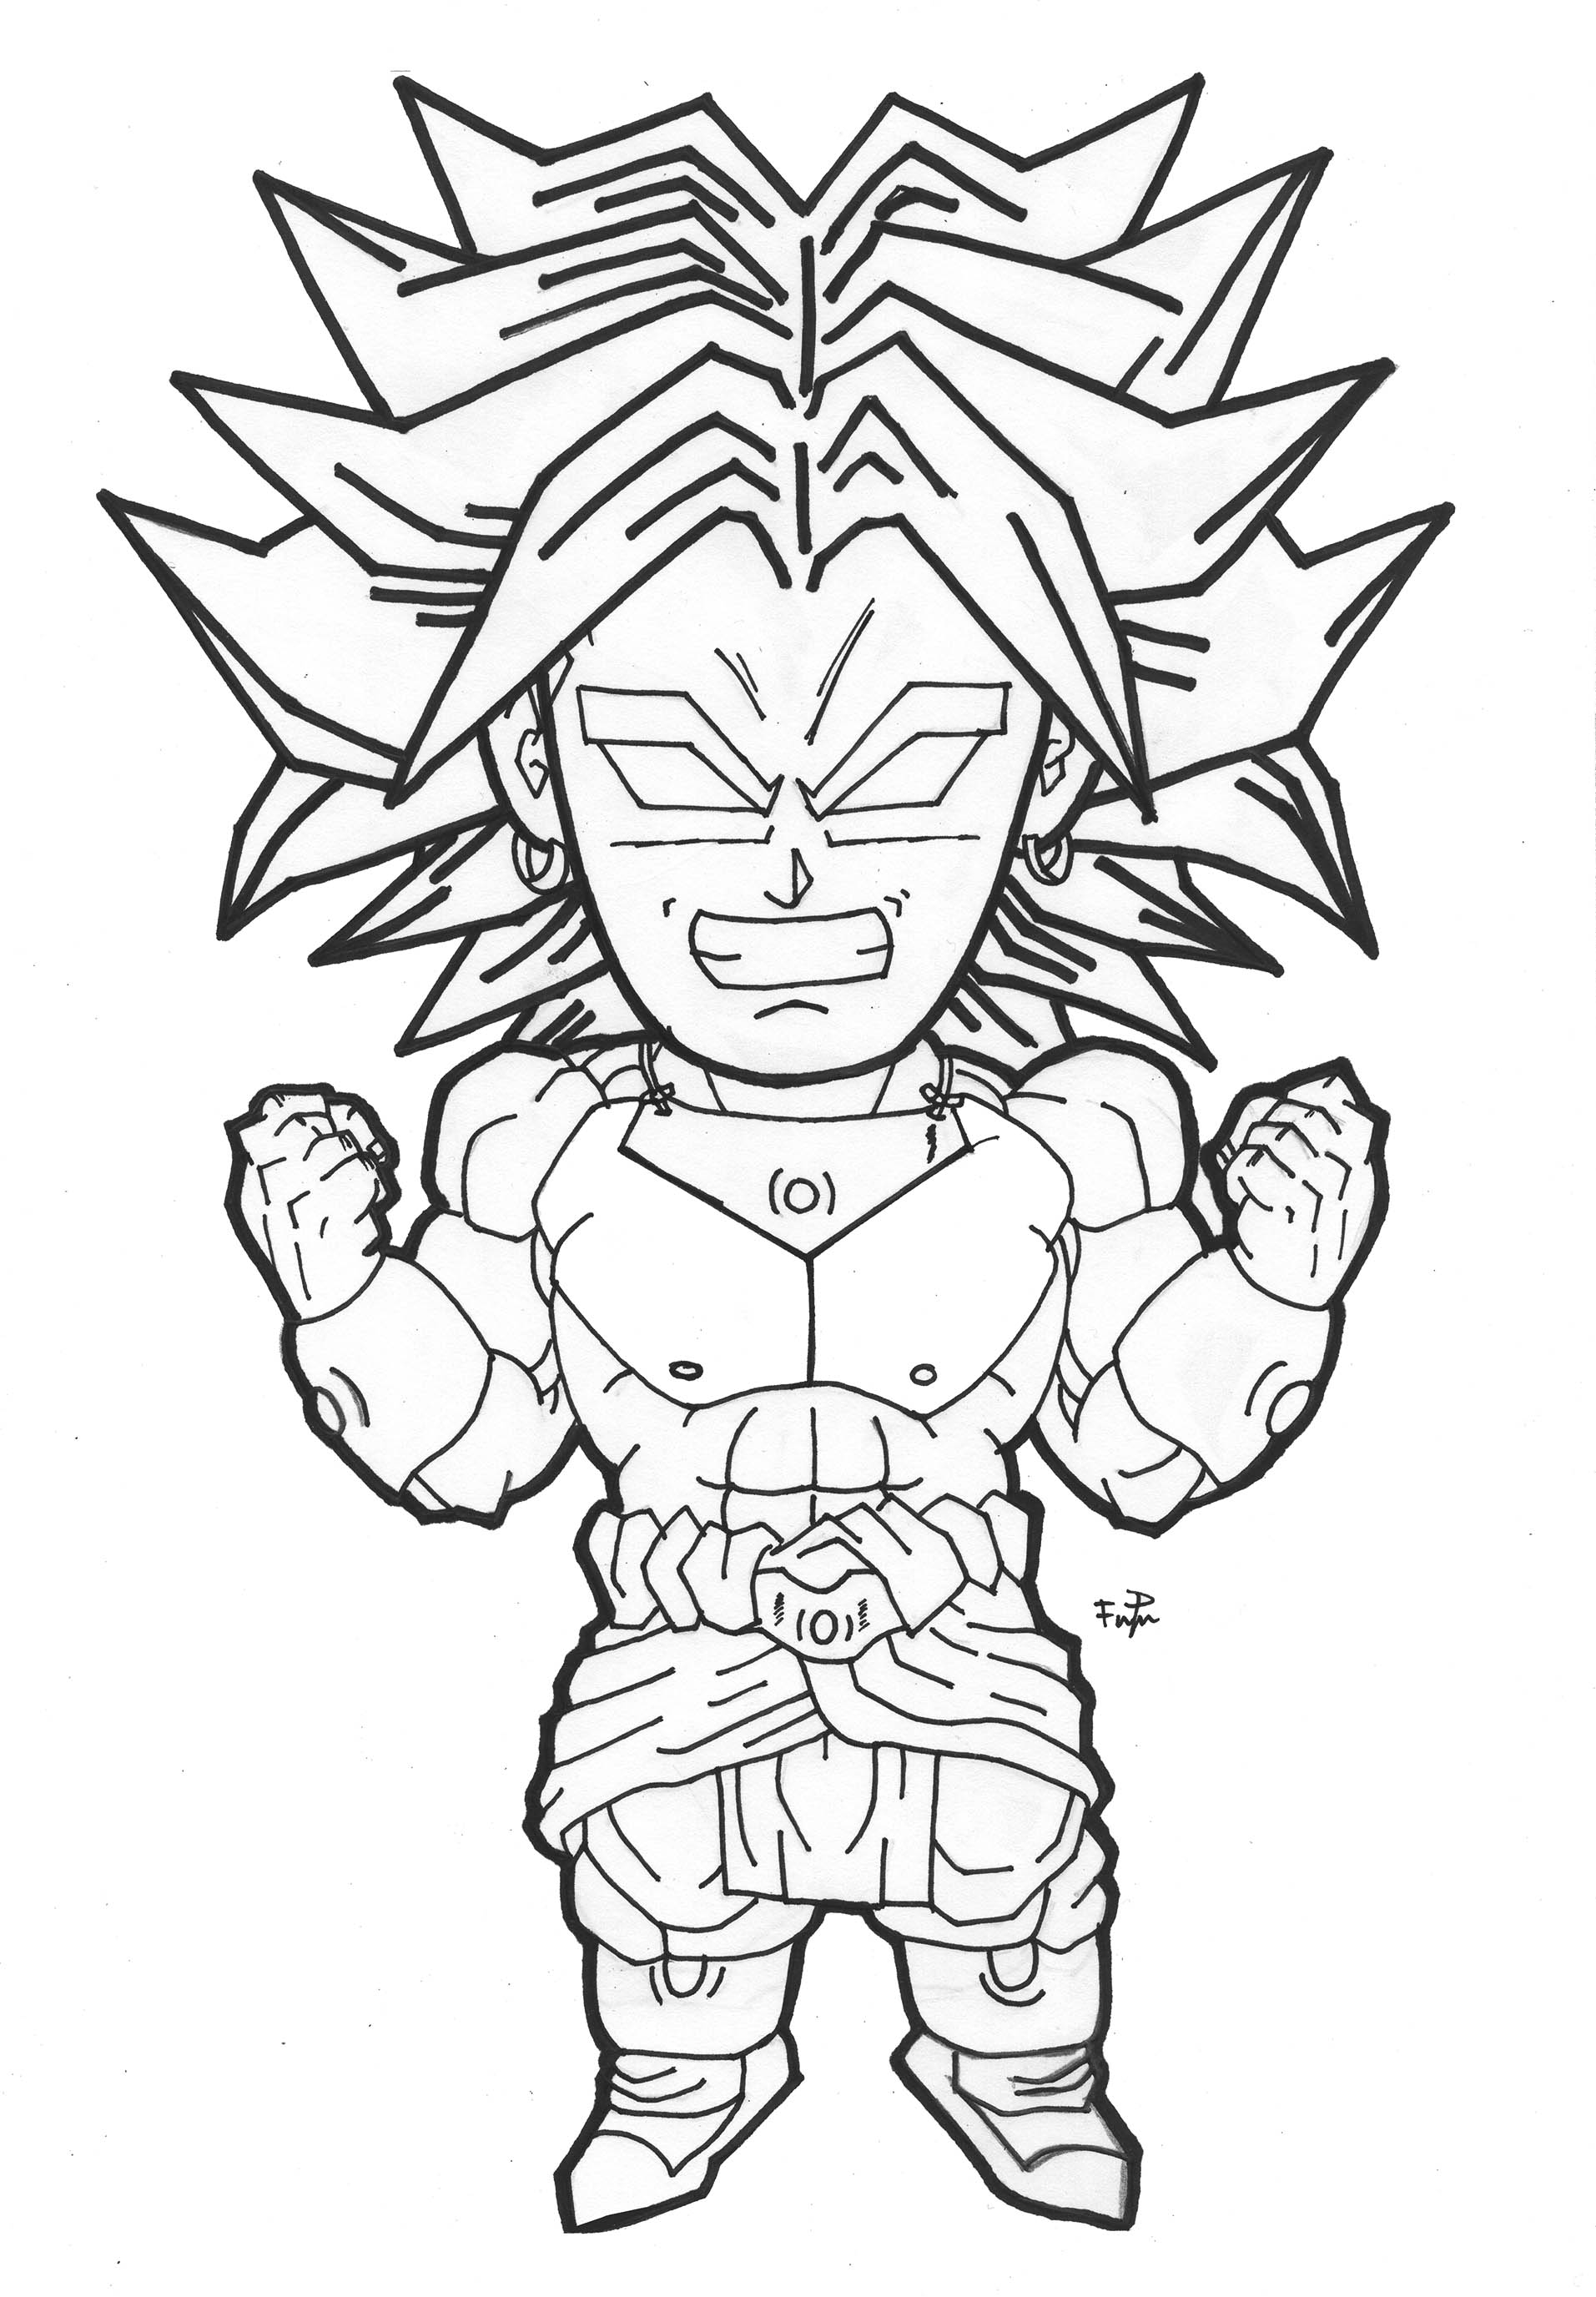 Broly Super Saiyajin Dragon Ball Z Kids Coloring Pages